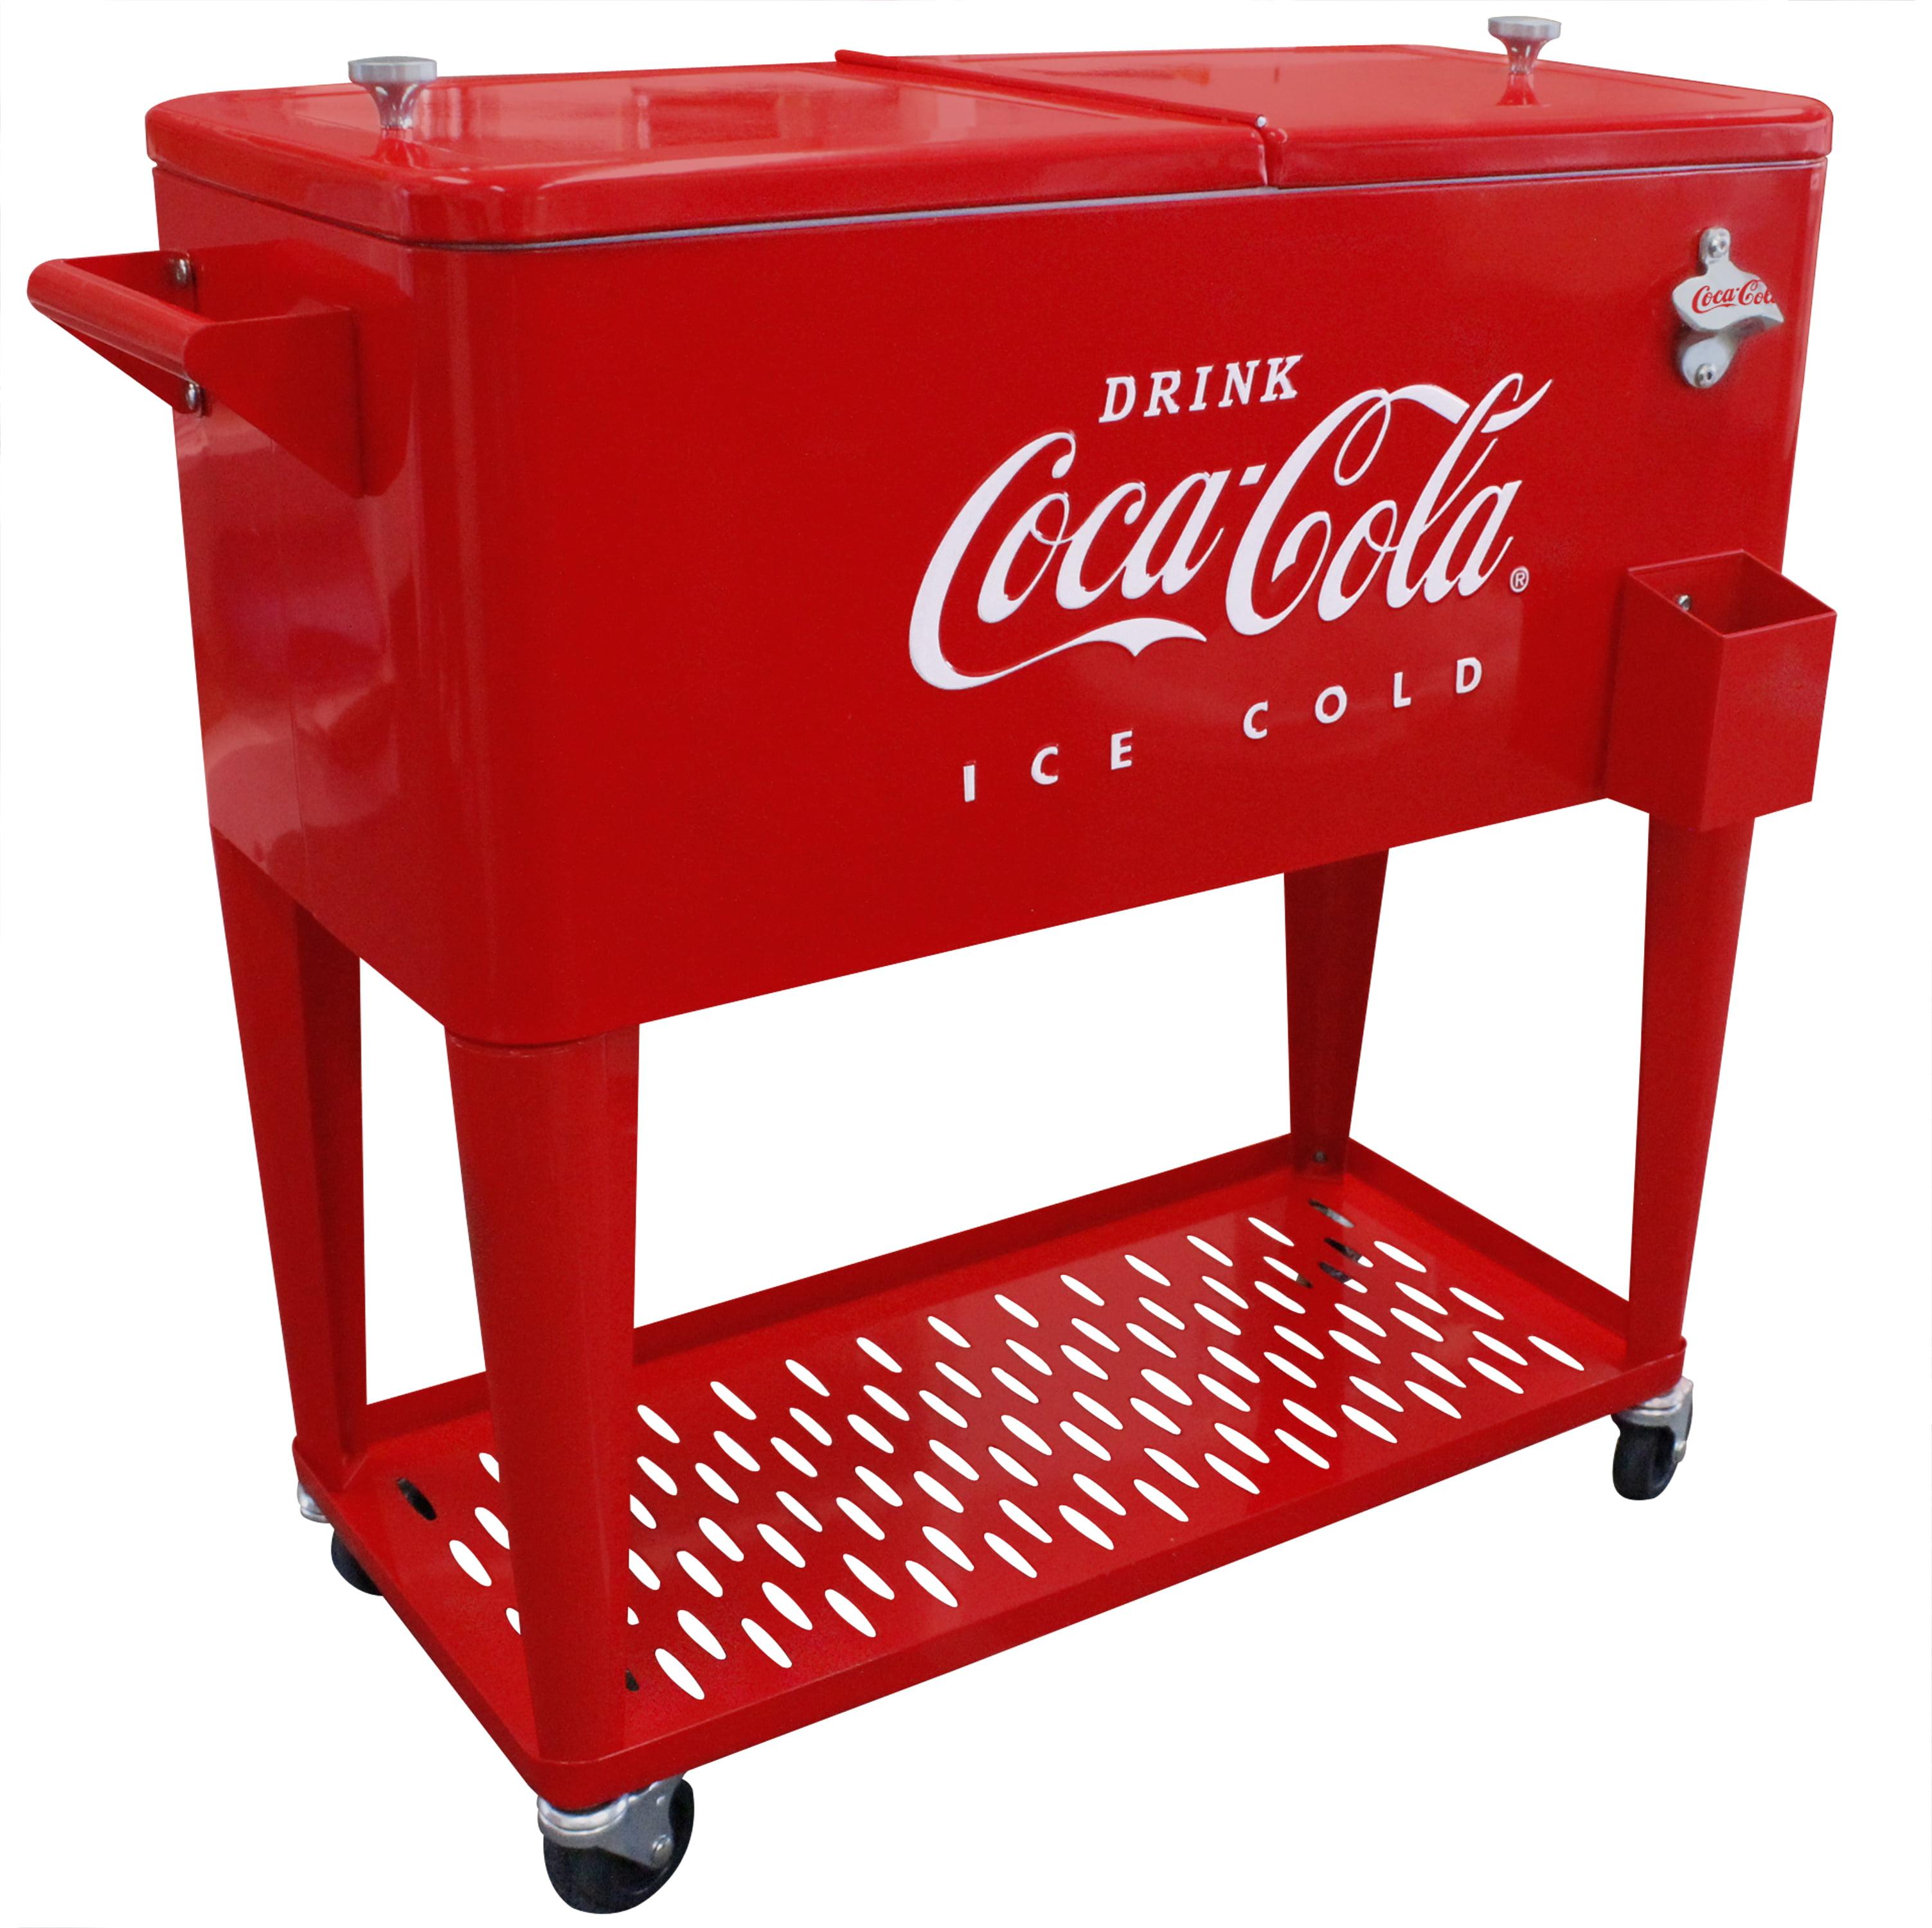 Vintage Coca Cola Cooler circa 1950 by mullockandmarvel on ...  Old Coca Cola Coolers